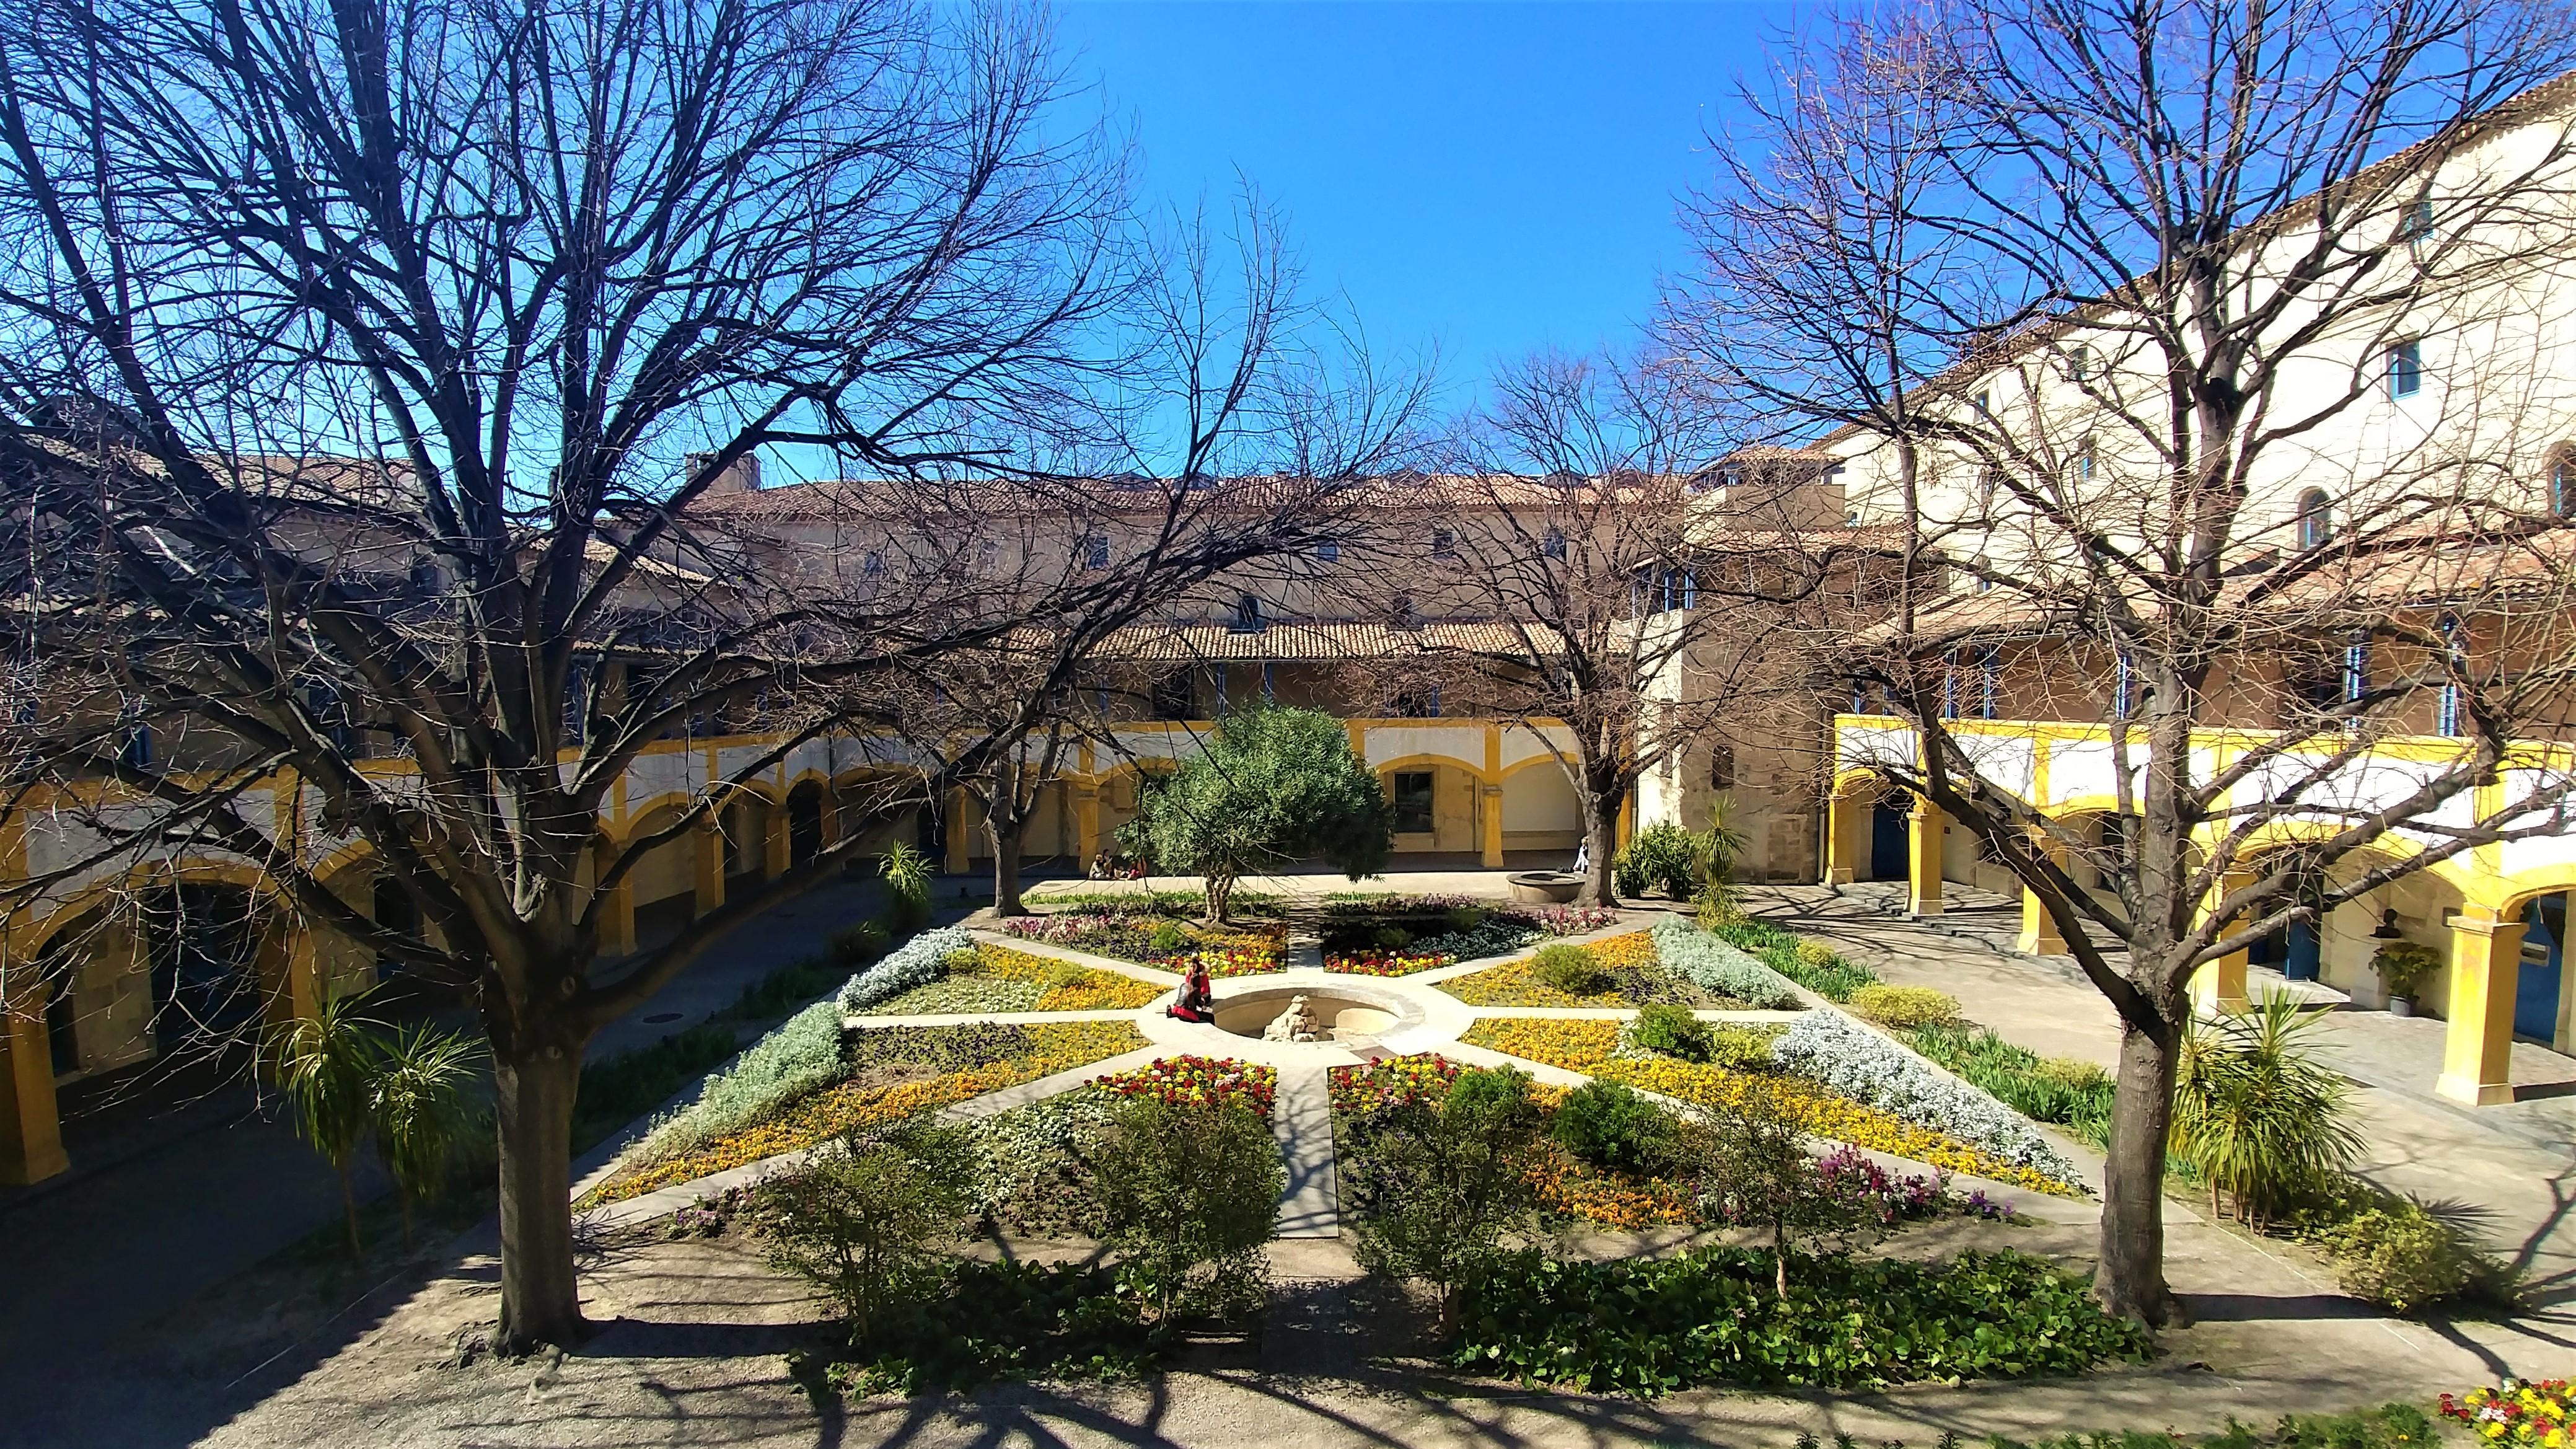 Arles Hotel-Dieu espace van gogh blog voyage provence arpenter le chemin